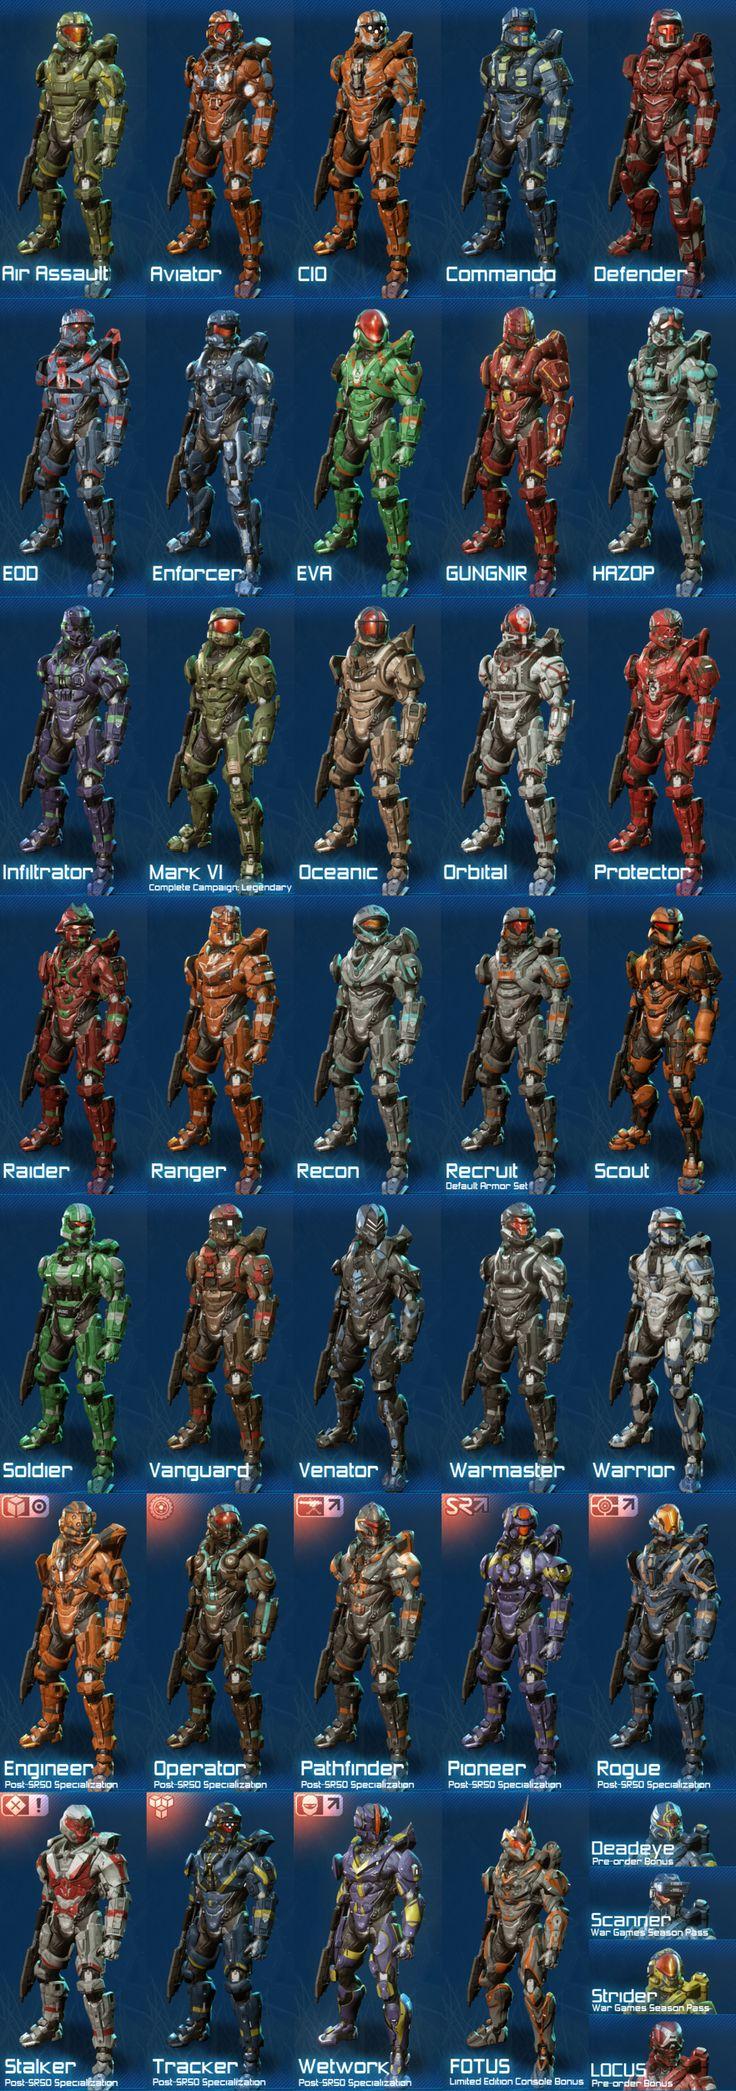 http://fc01.deviantart.net/fs70/i/2012/304/b/7/all_halo_4_armor_by_sithvenator-d5jlcc1.png